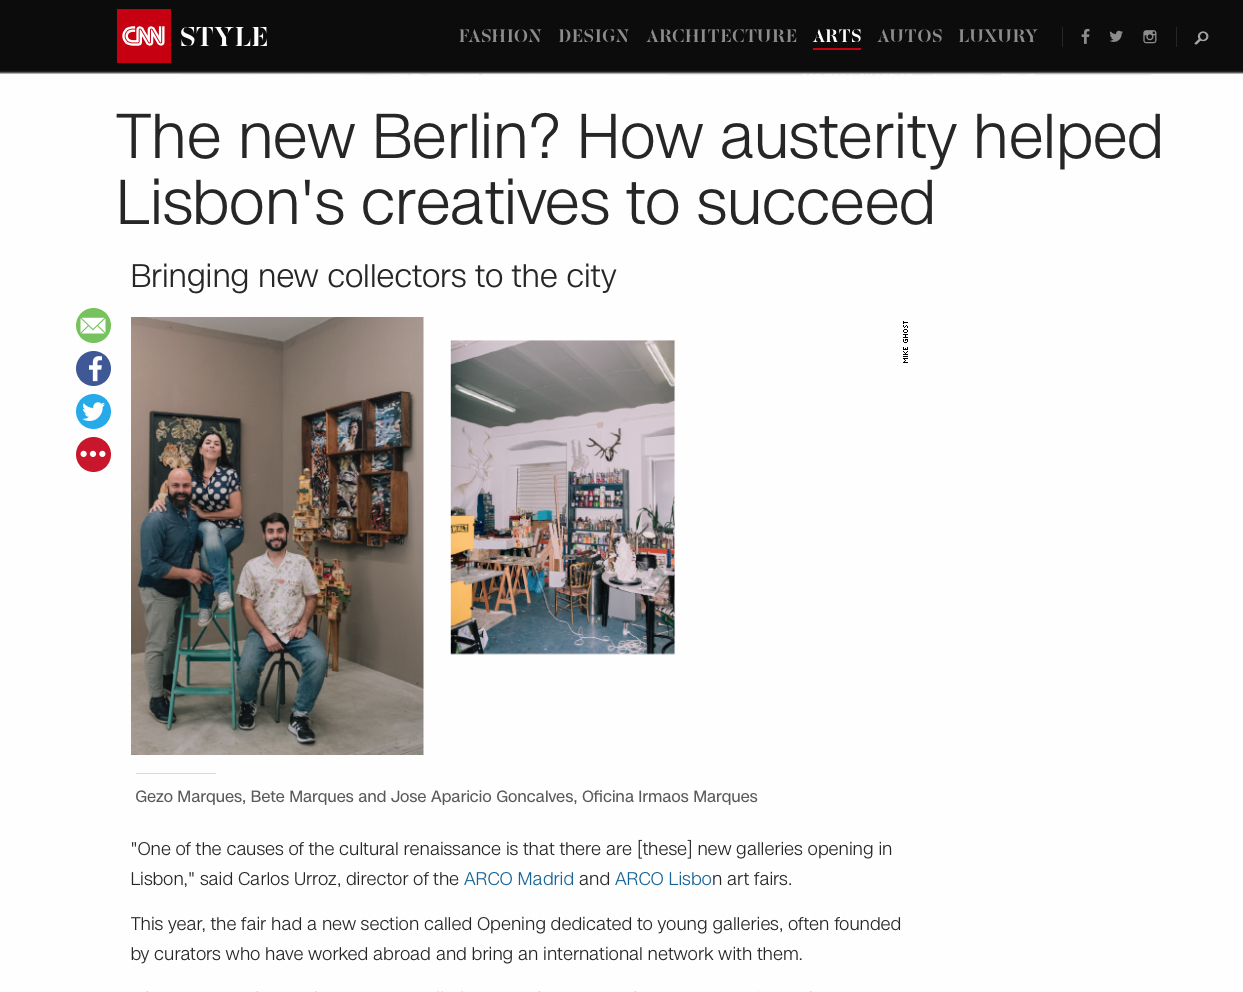 https://edition.cnn.com/style/article/lisbon-cultural-scene/index.html